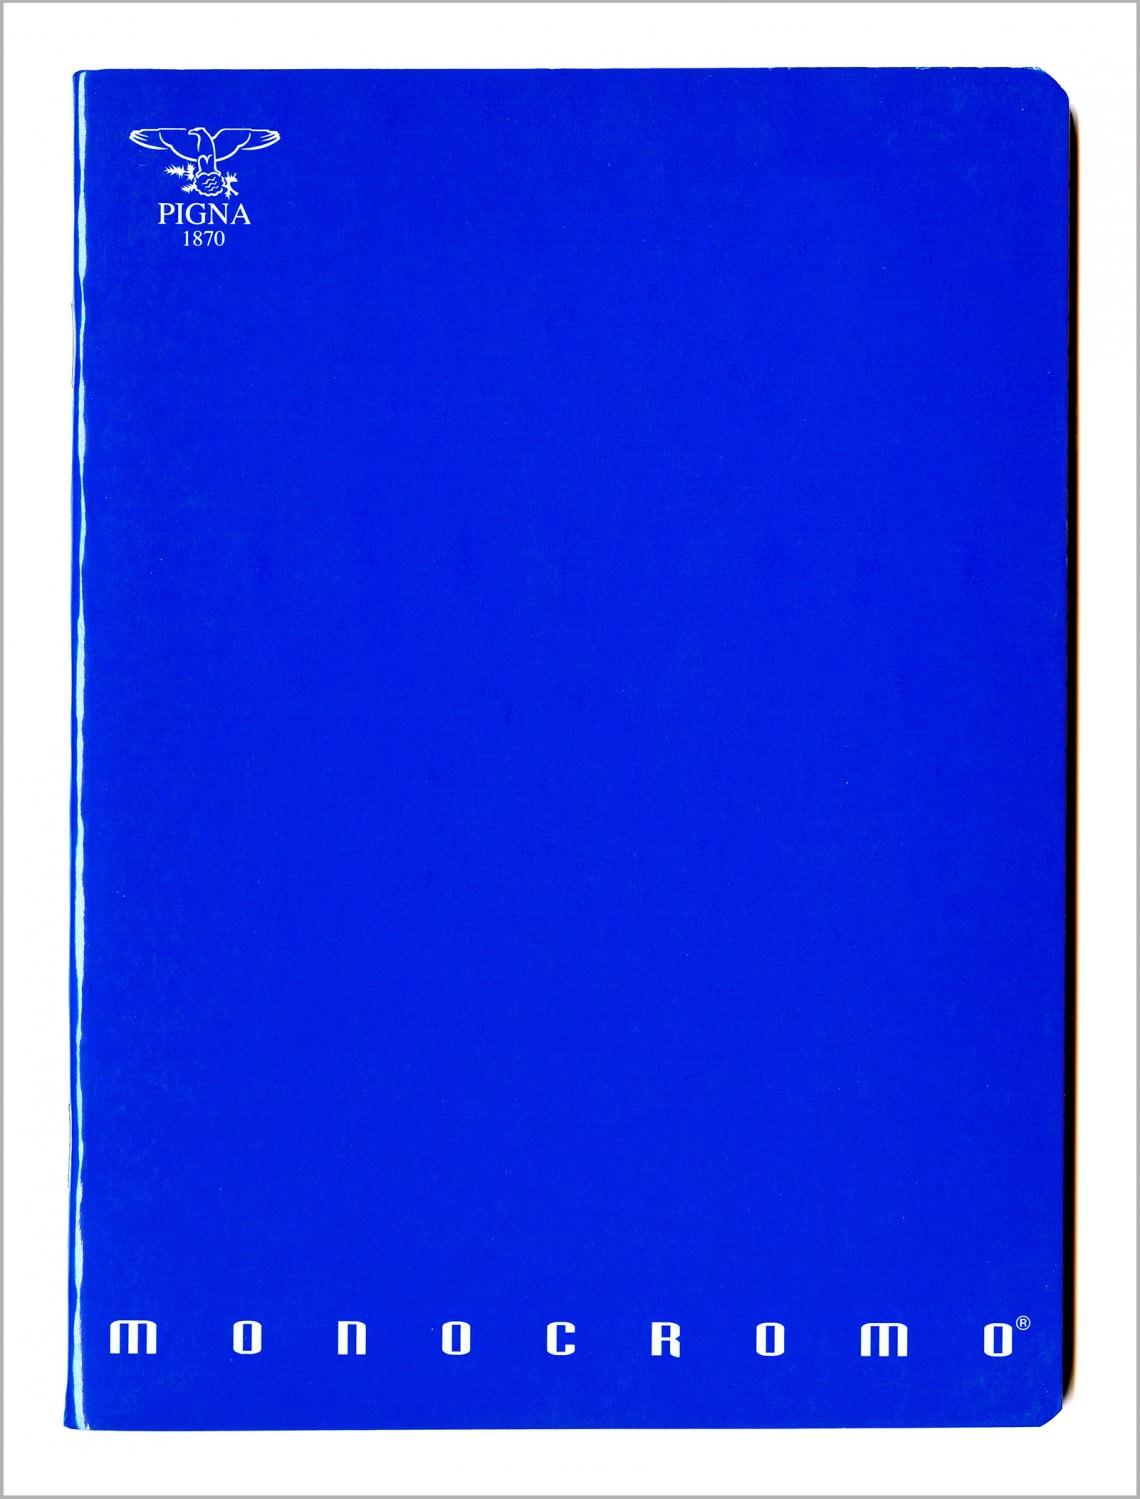 - monochromo (rosso, giallo, blu)